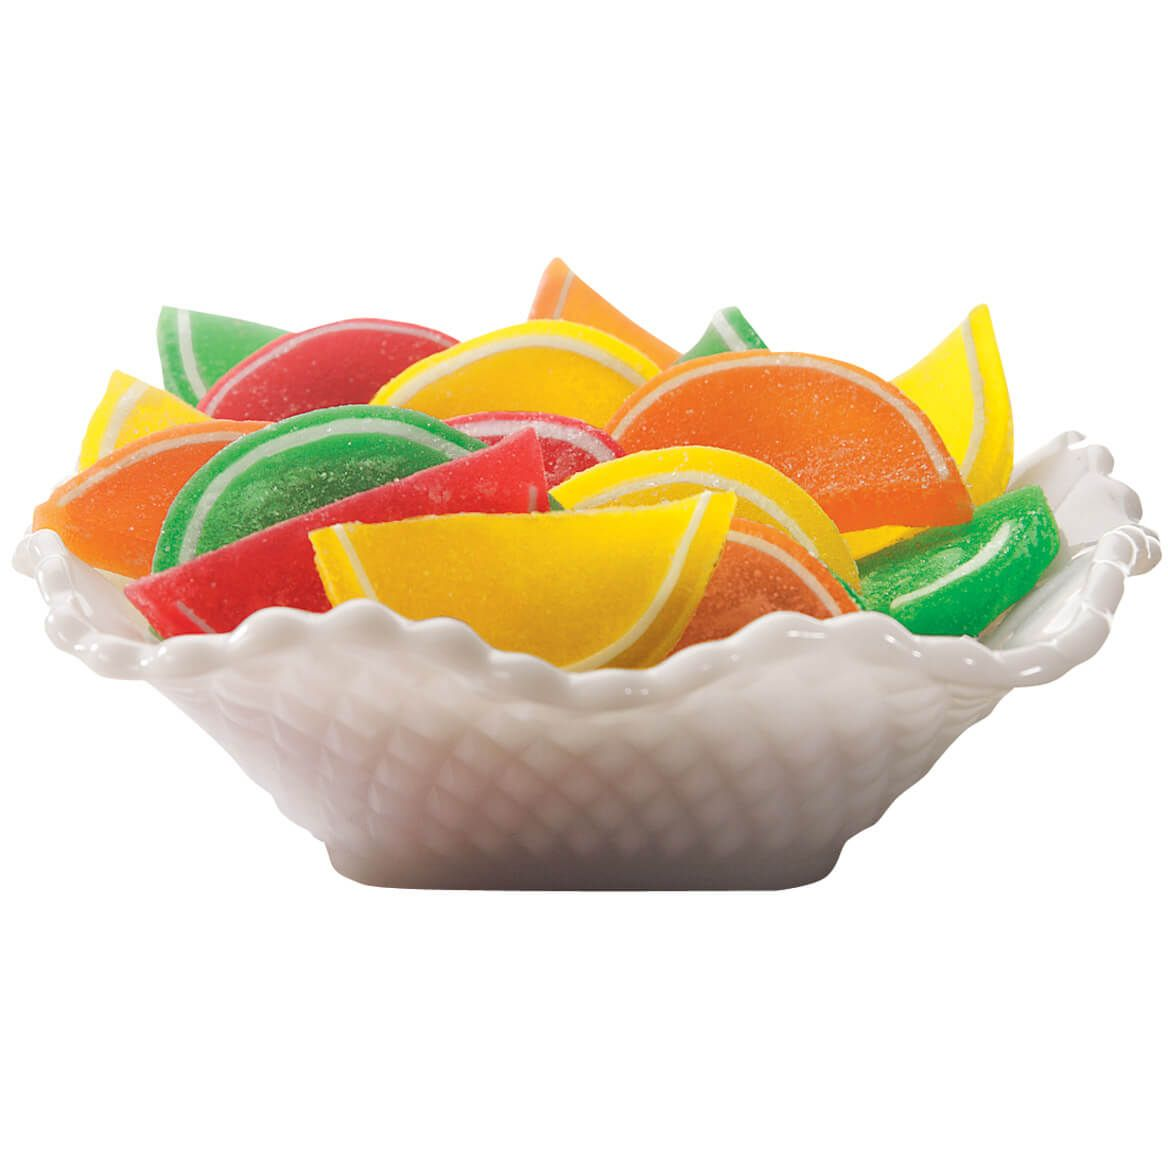 Sugar Free Fruit Slices 5 oz Bag-317276